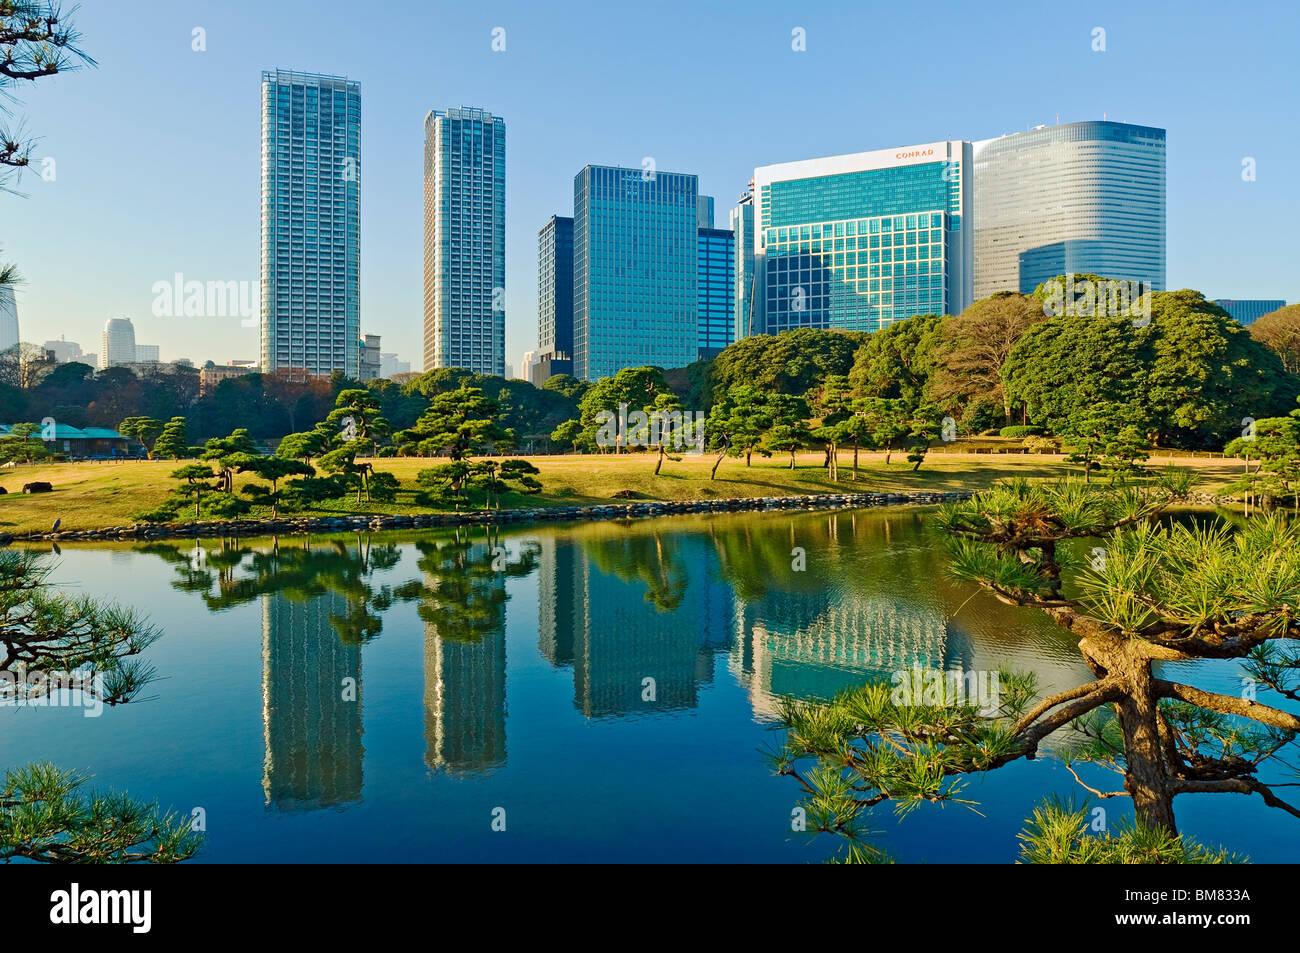 Hama Rikyu Gardens Garden Shiodome Skyline Japan - Stock Image